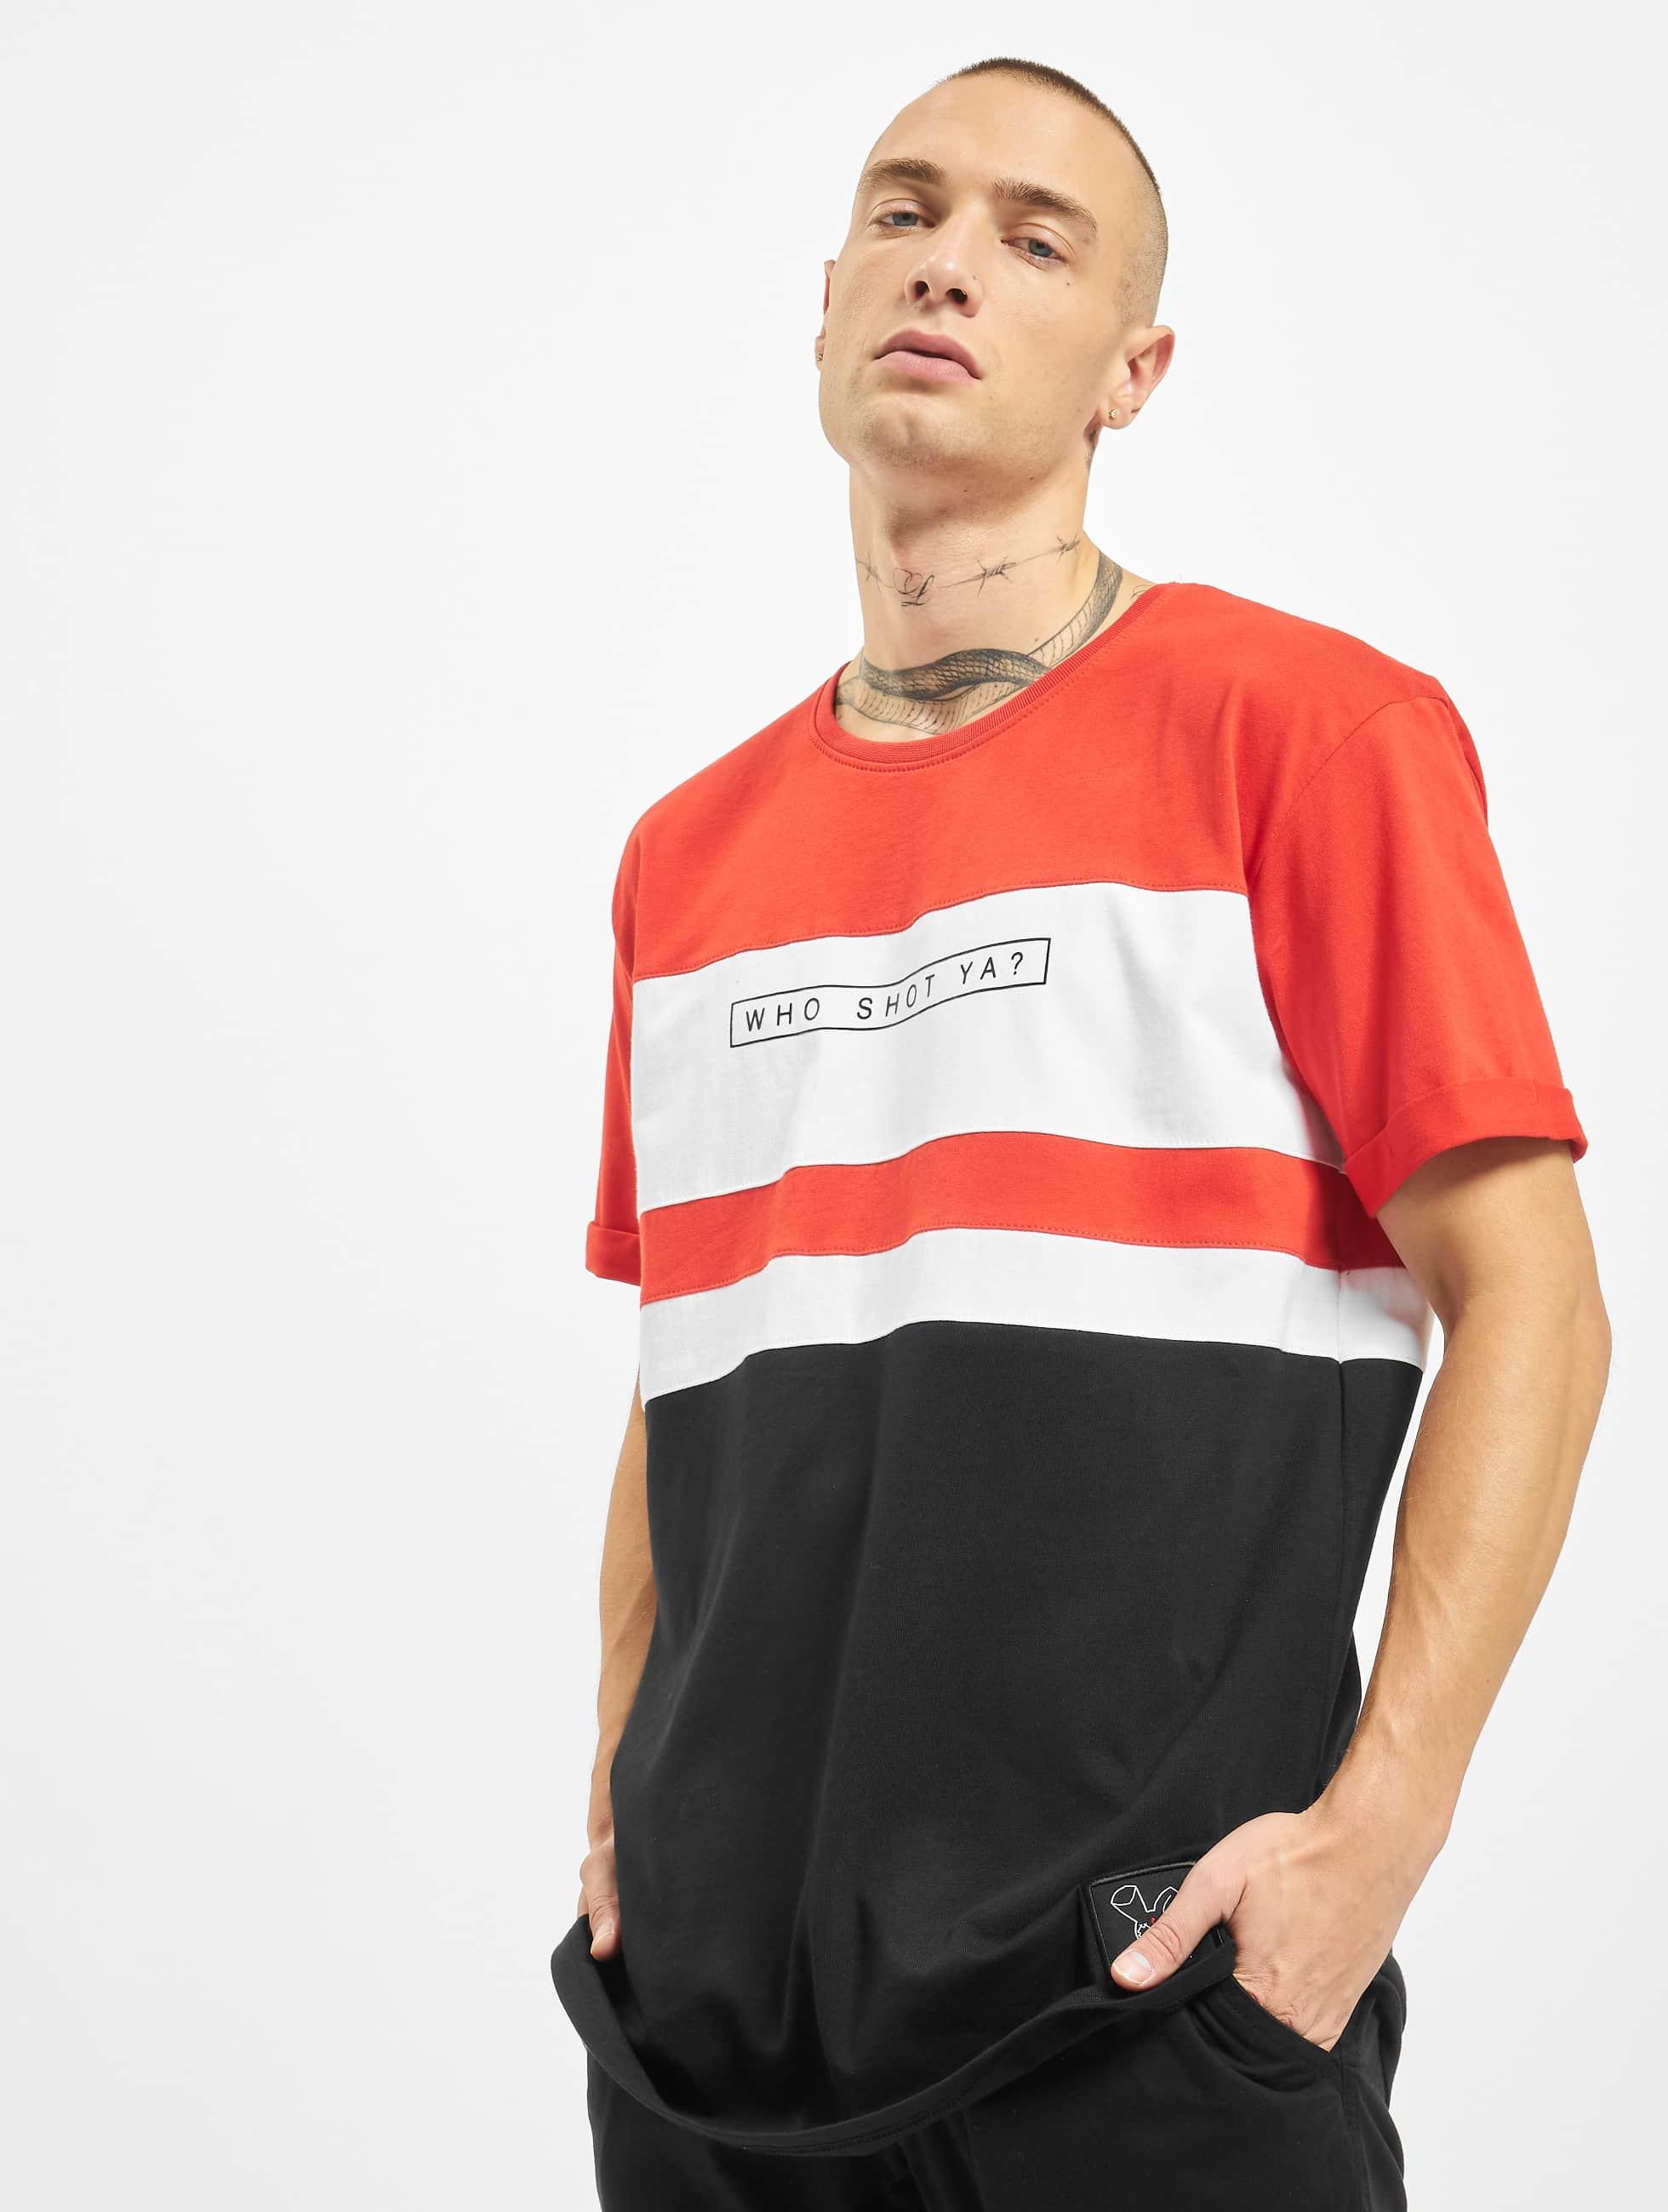 Who Shot Ya? / T-Shirt Forse in black XL